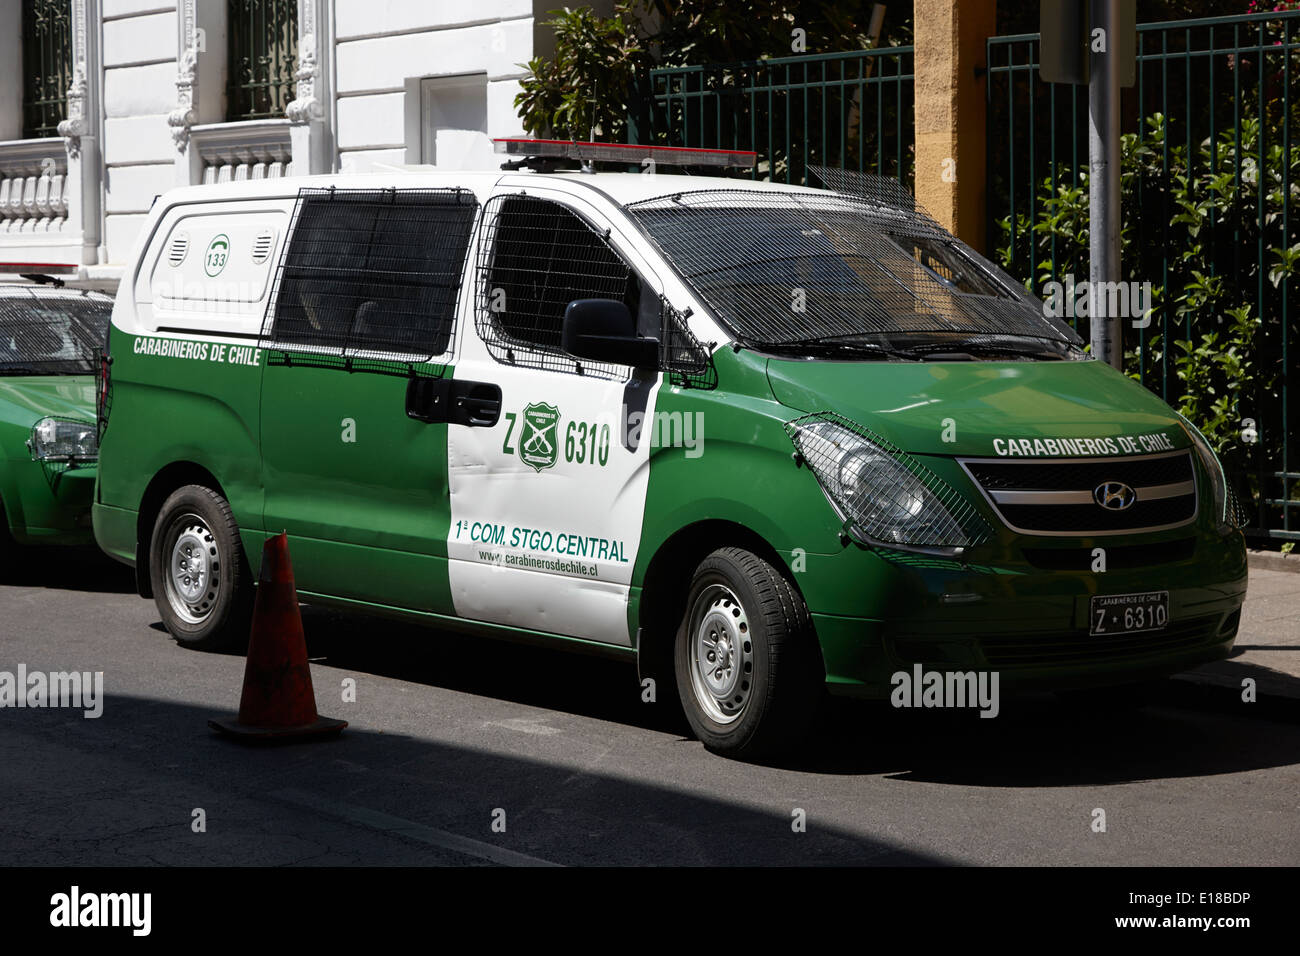 carabineros de chile national police radio patrol riot van vehicle in downtown Santiago Chile - Stock Image